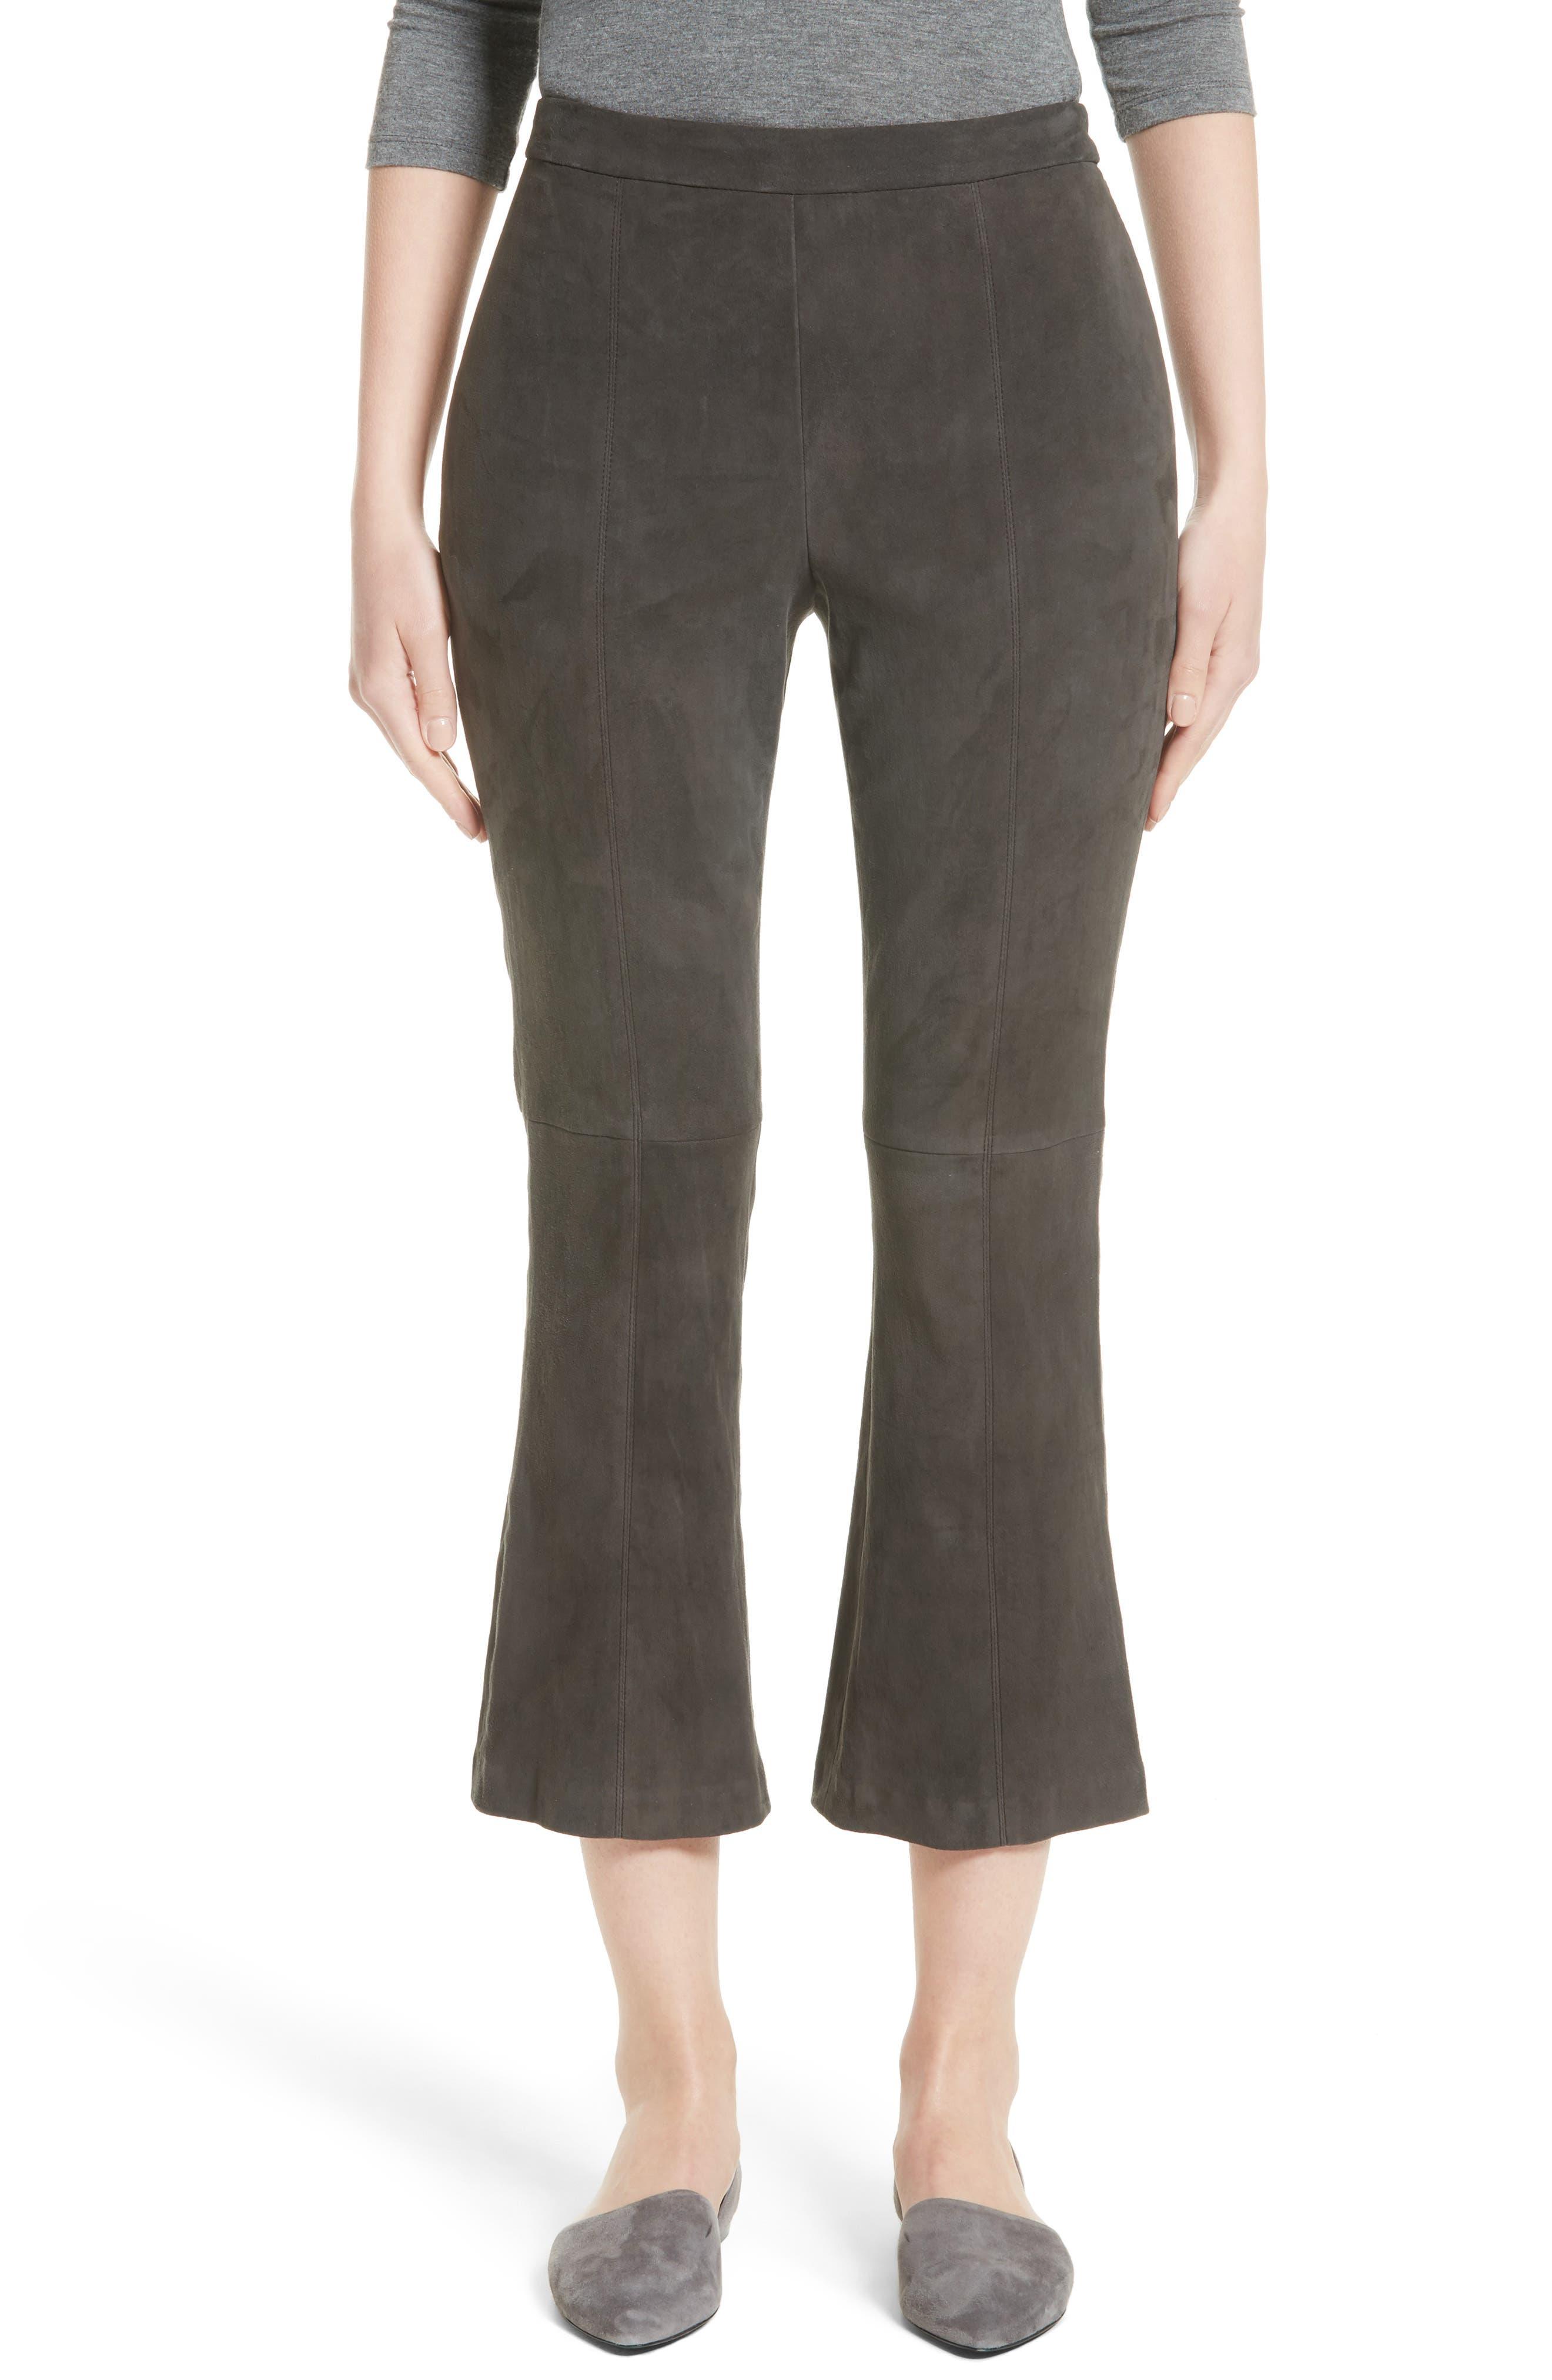 St. John Collection Stretch Suede Capri Pants